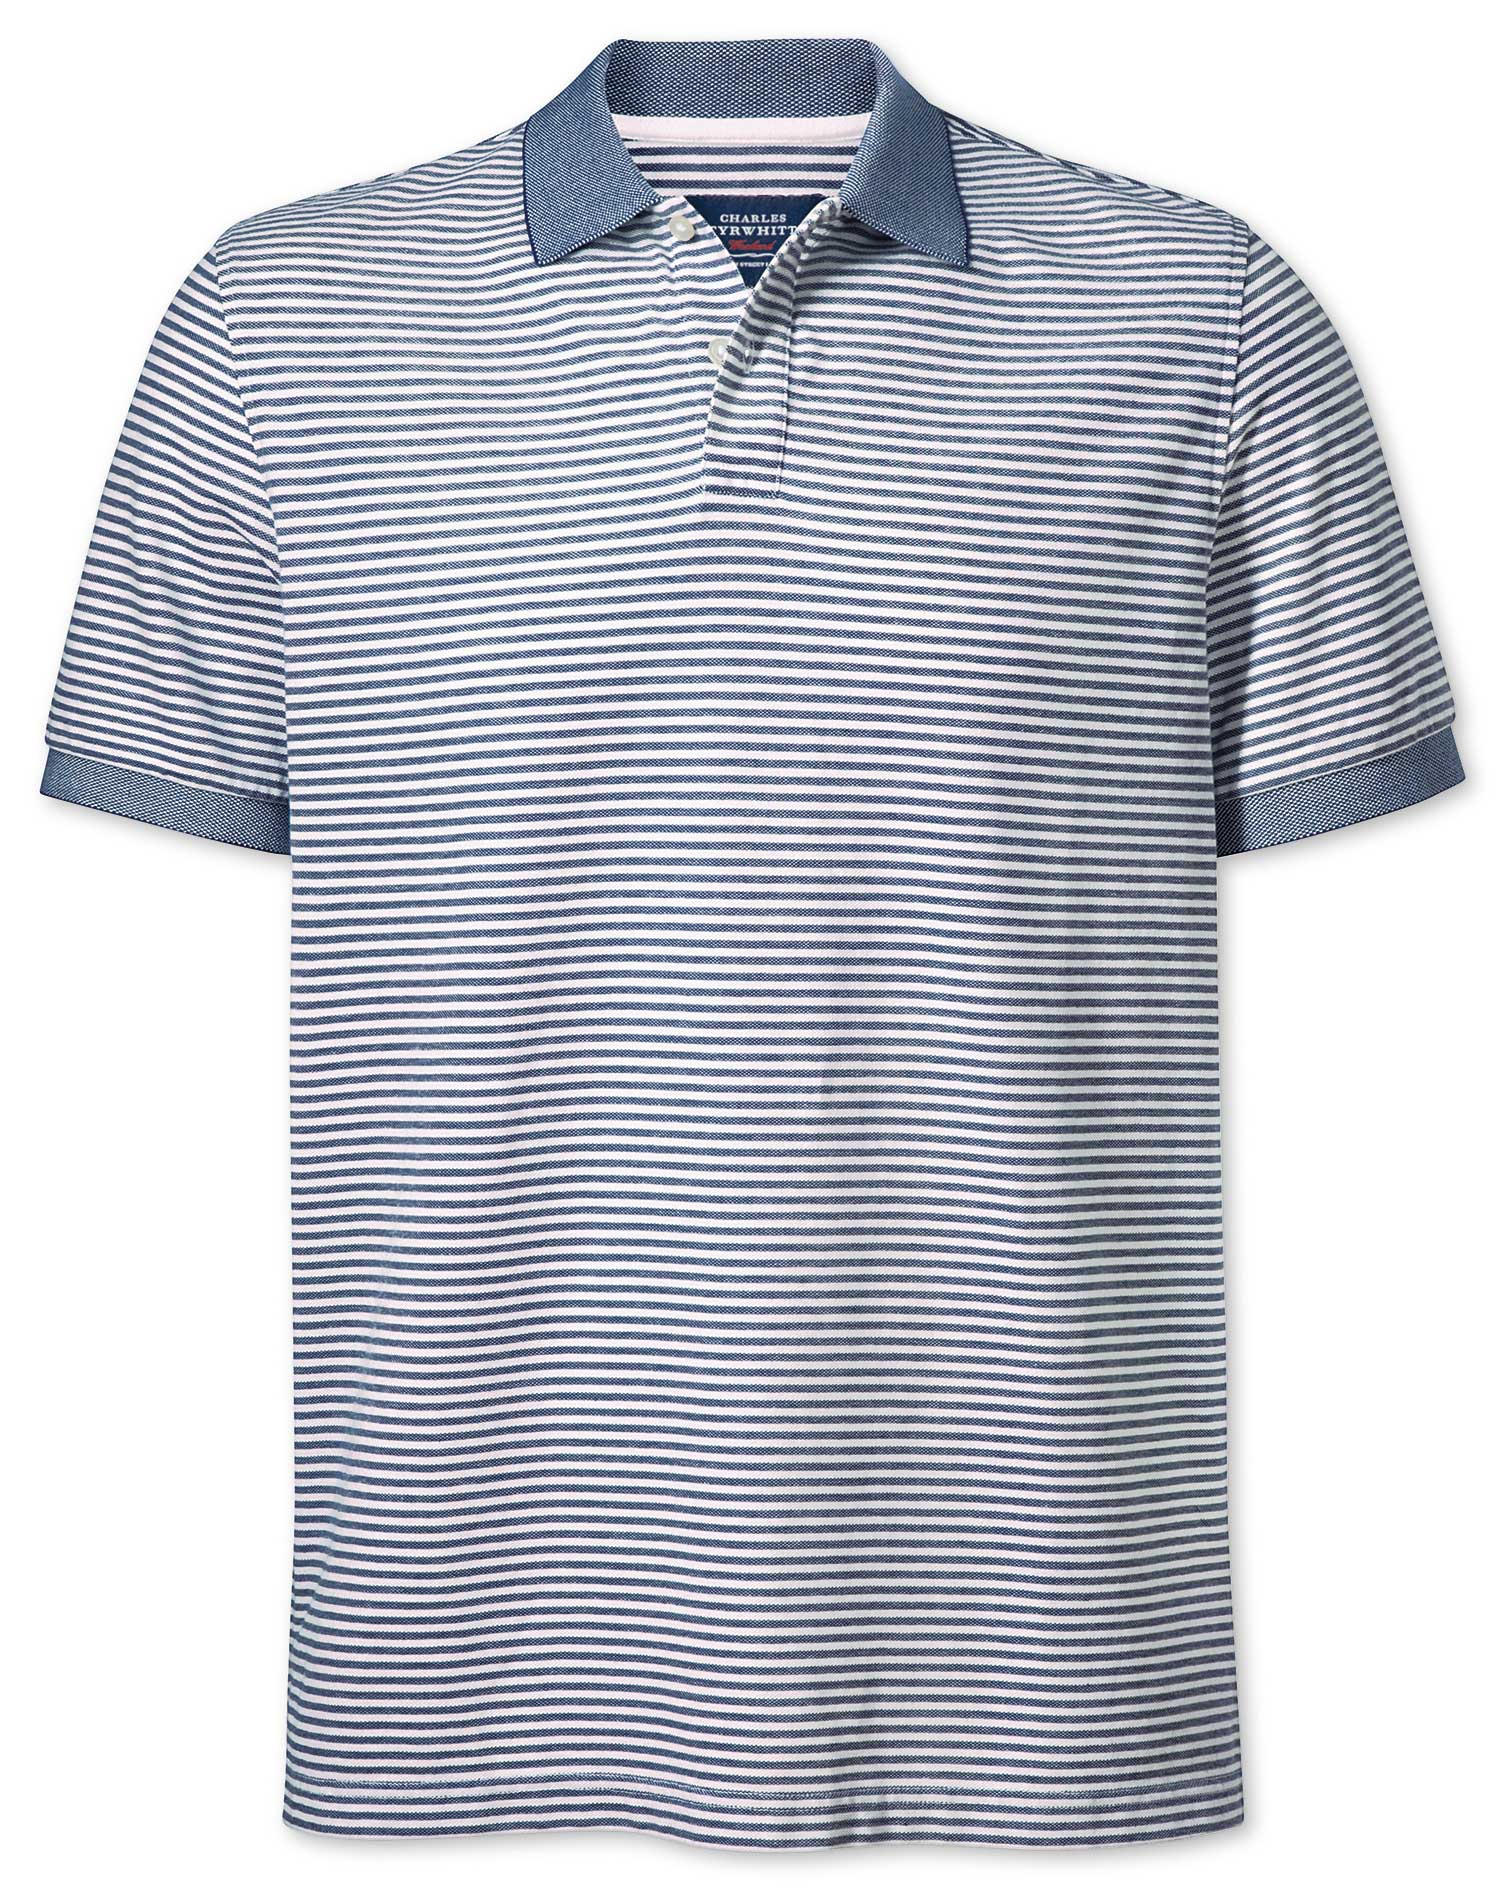 Navy and White Stripe Oxford Cotton Polo Size XS by Charles Tyrwhitt